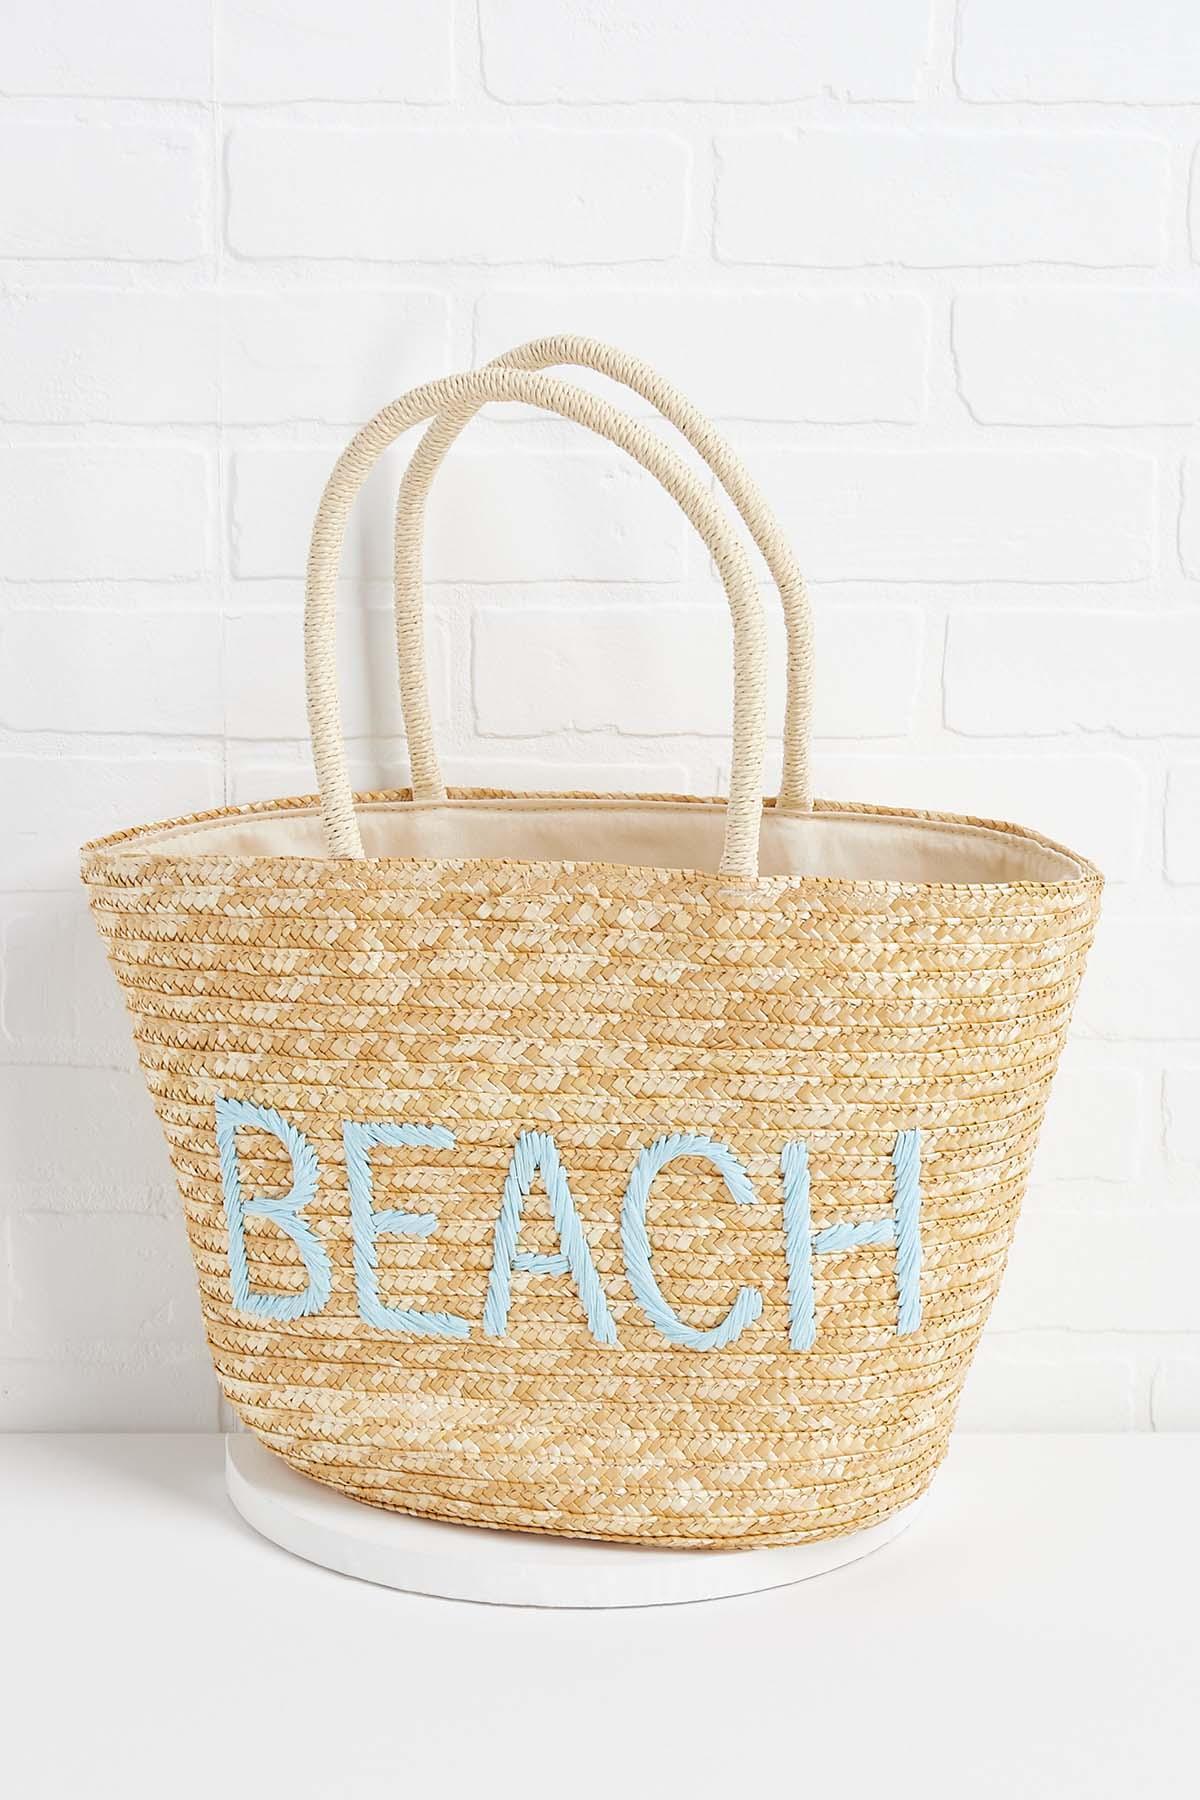 Meet Me At The Beach Tote